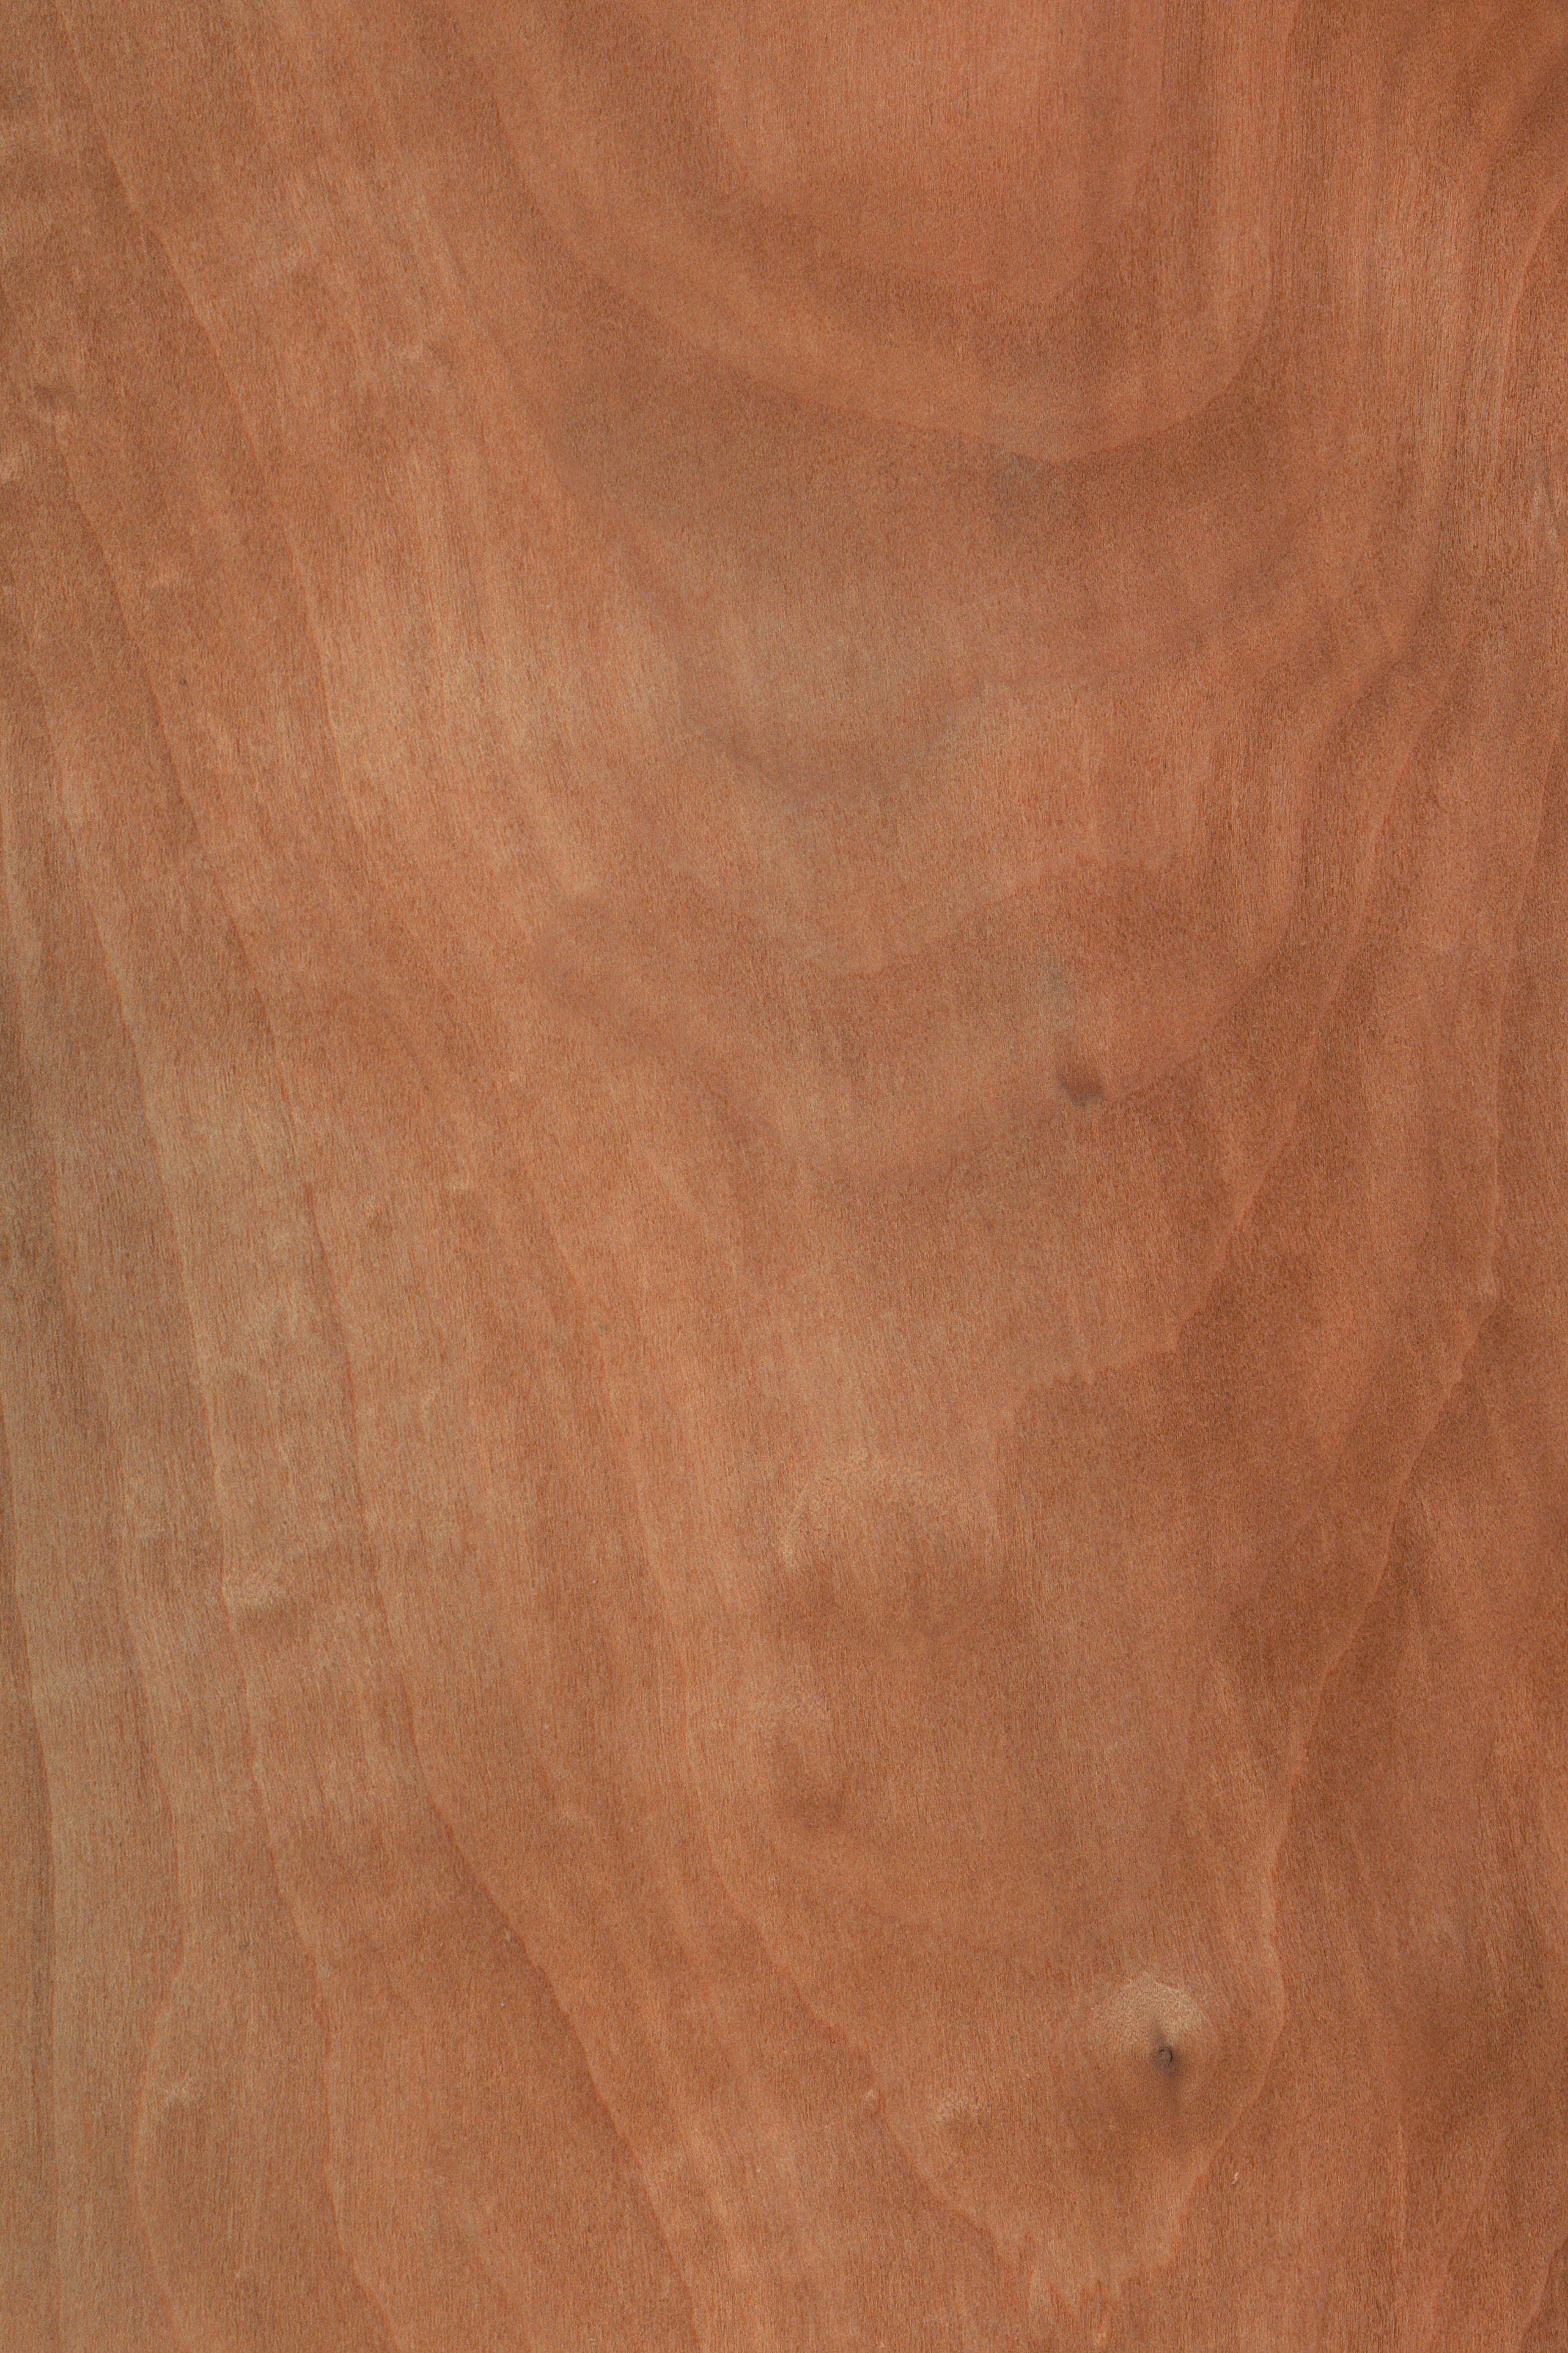 Apfelbaum | Furnier: Holzart, Apfel, Blatt, hell, braun ...